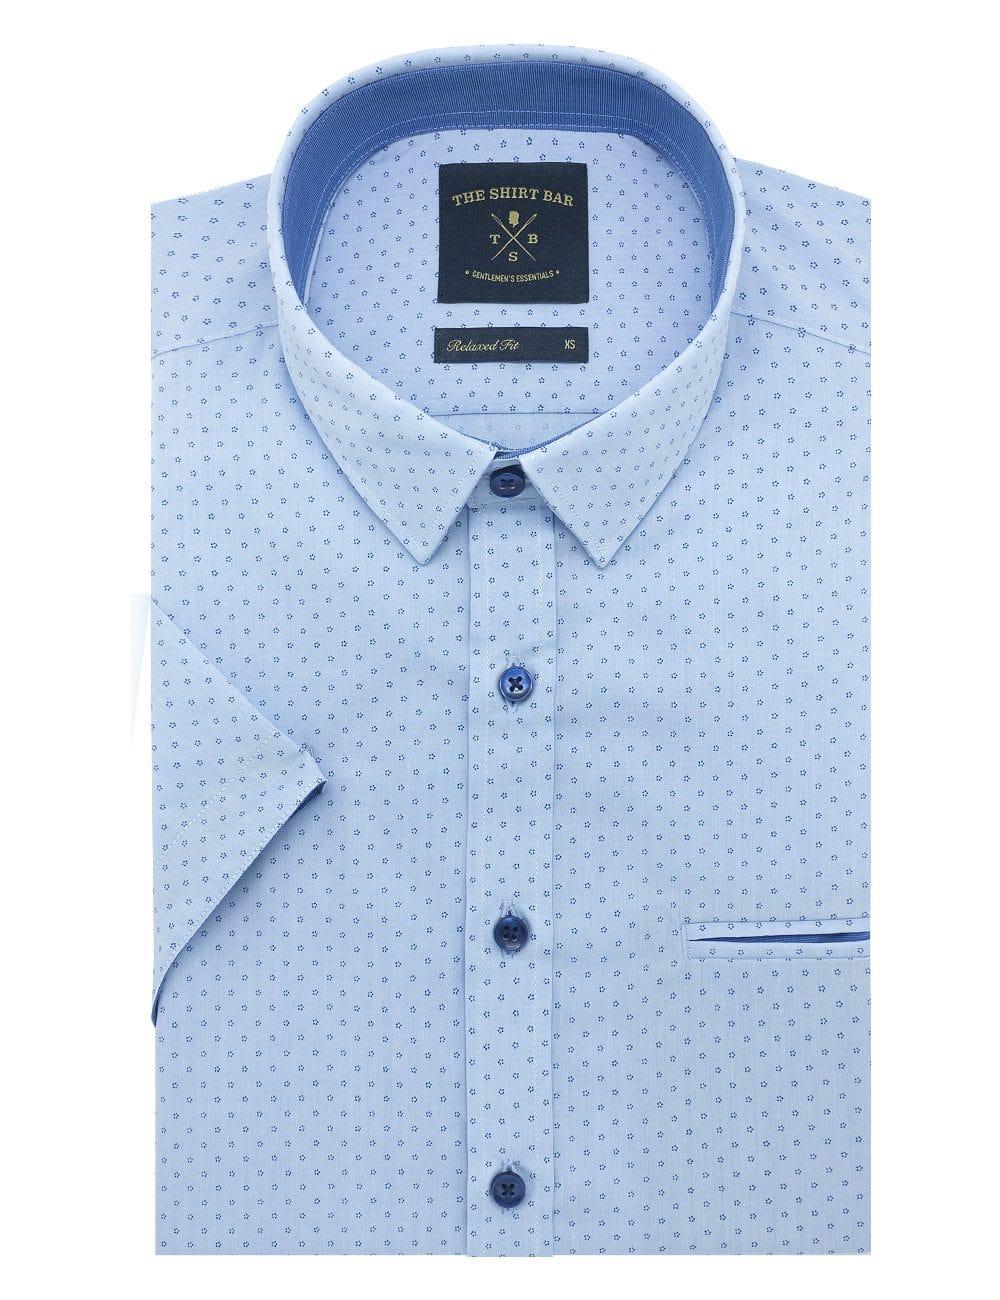 Blue with Navy Mini Flower Print Custom / Relaxed Fit Short Sleeve Shirt – RF9SNB5.19